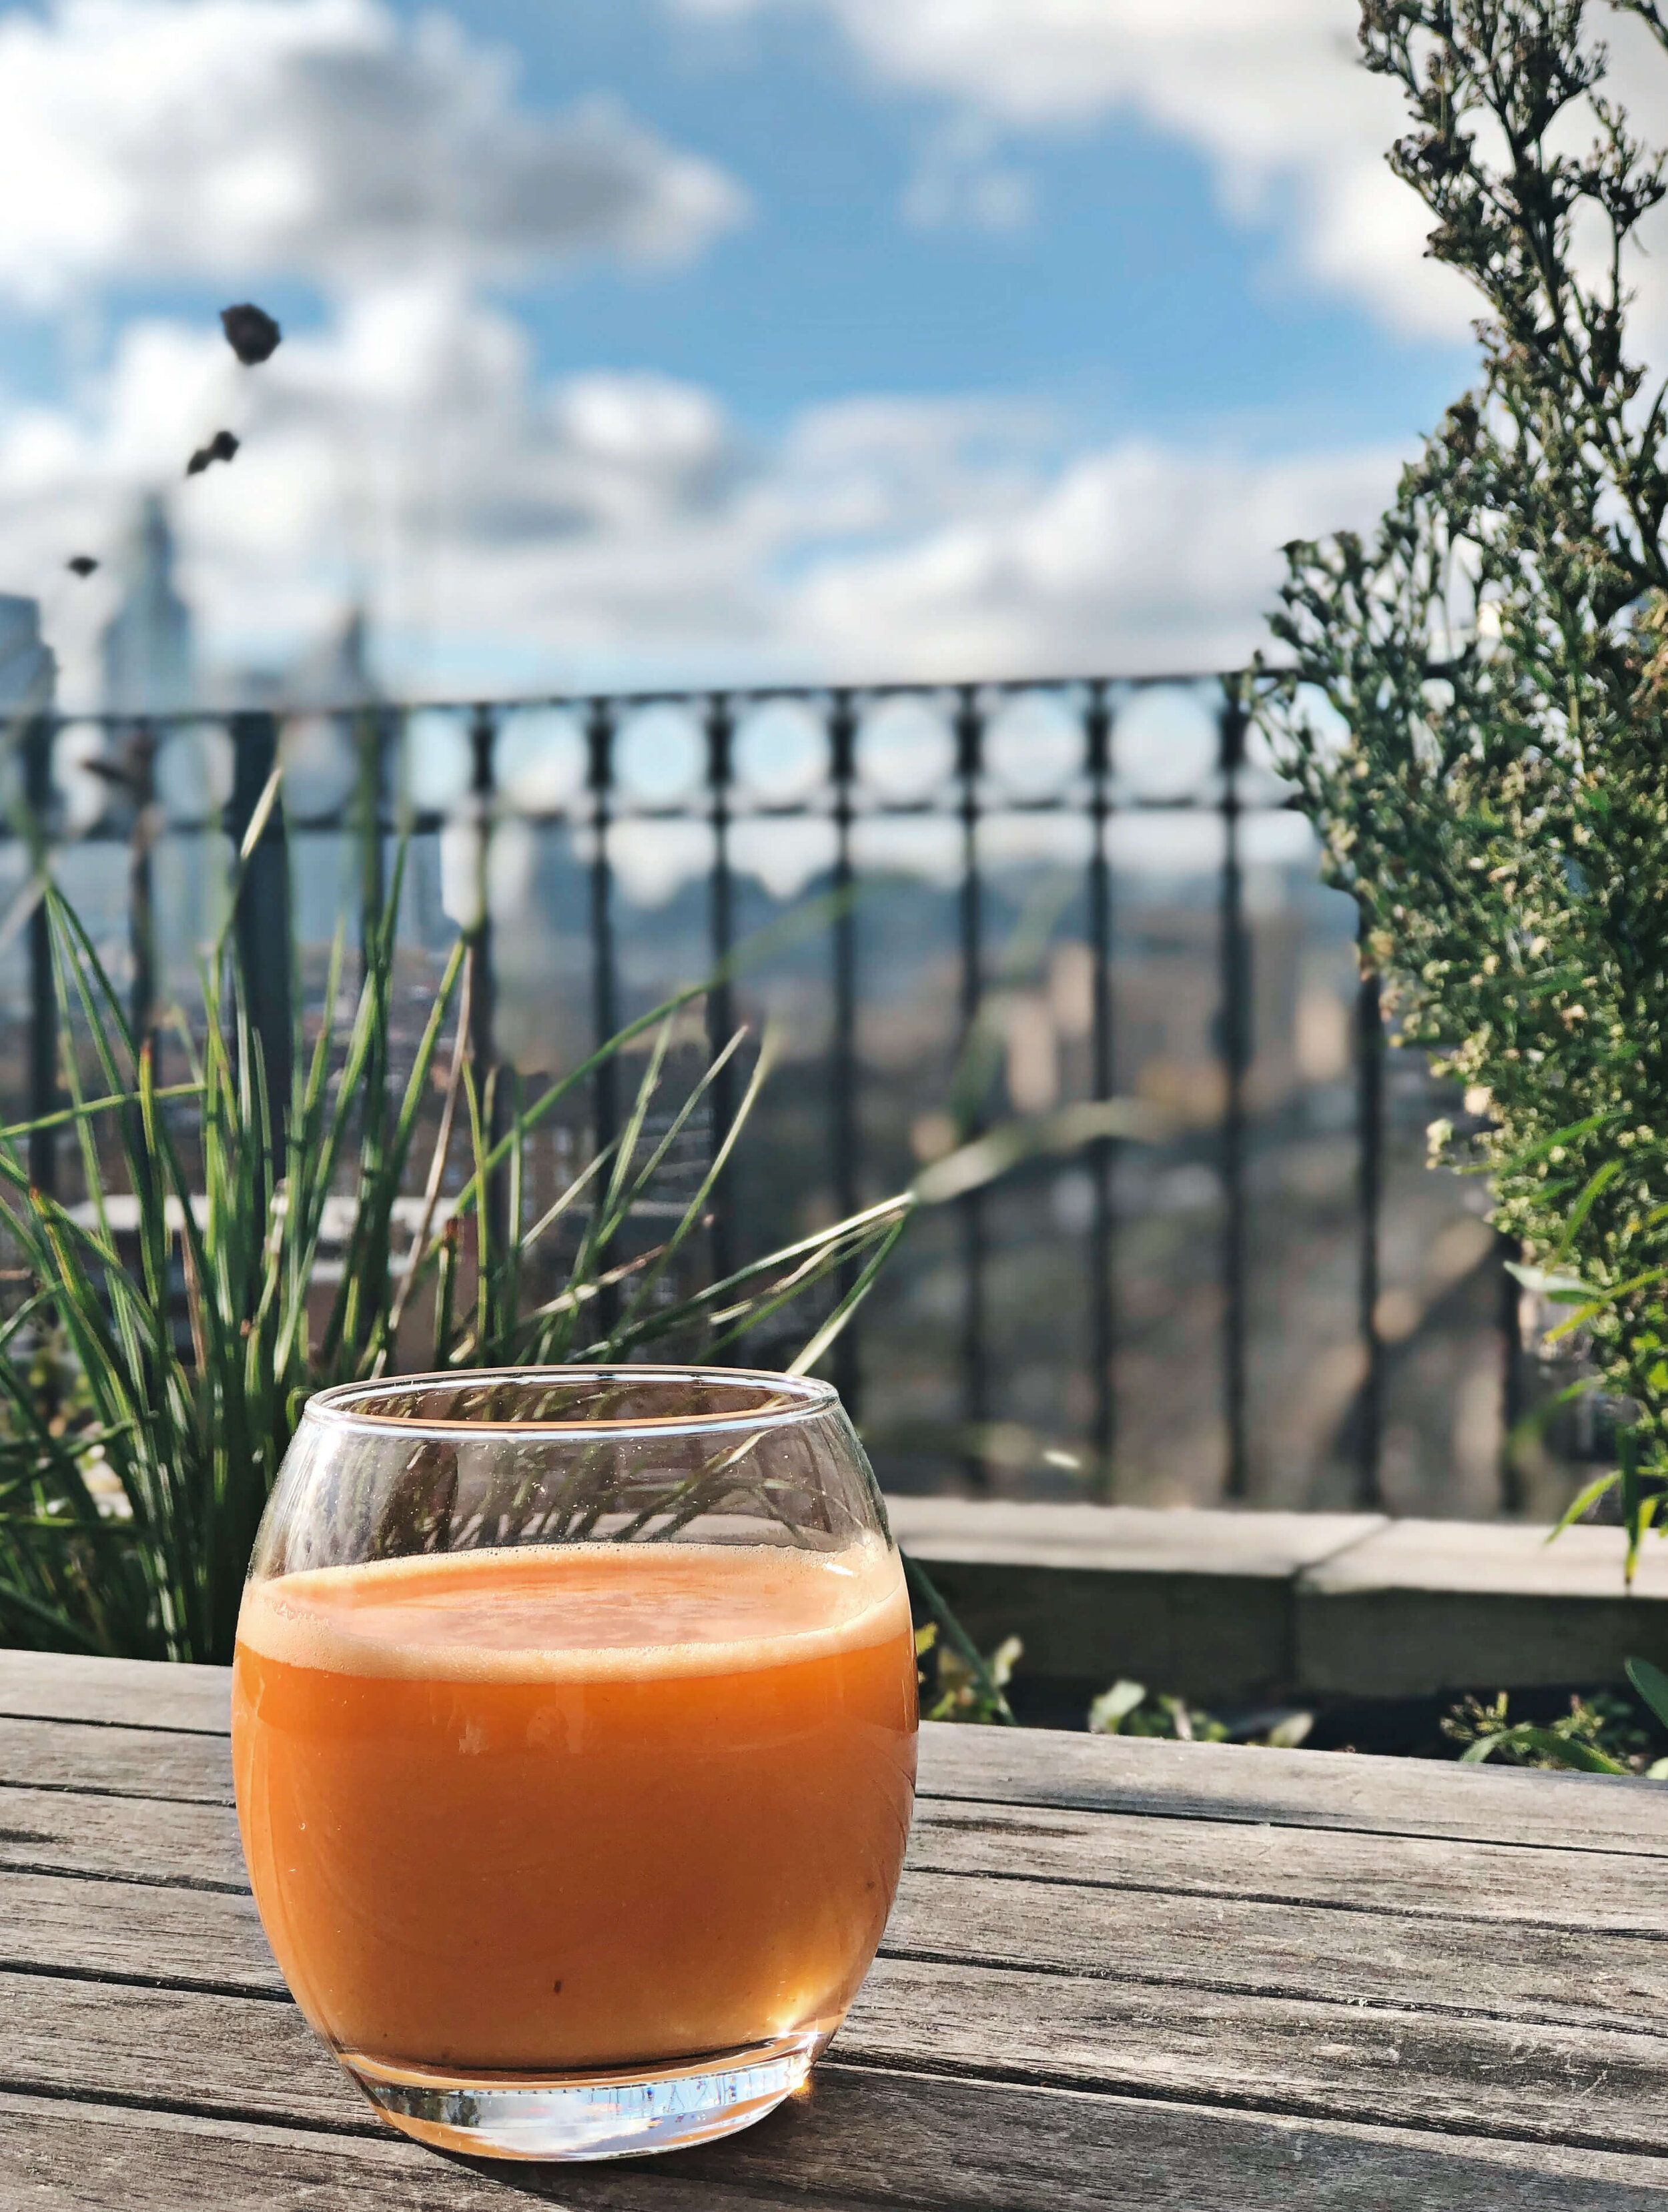 Organic Pineapple Carrot Detox Juice